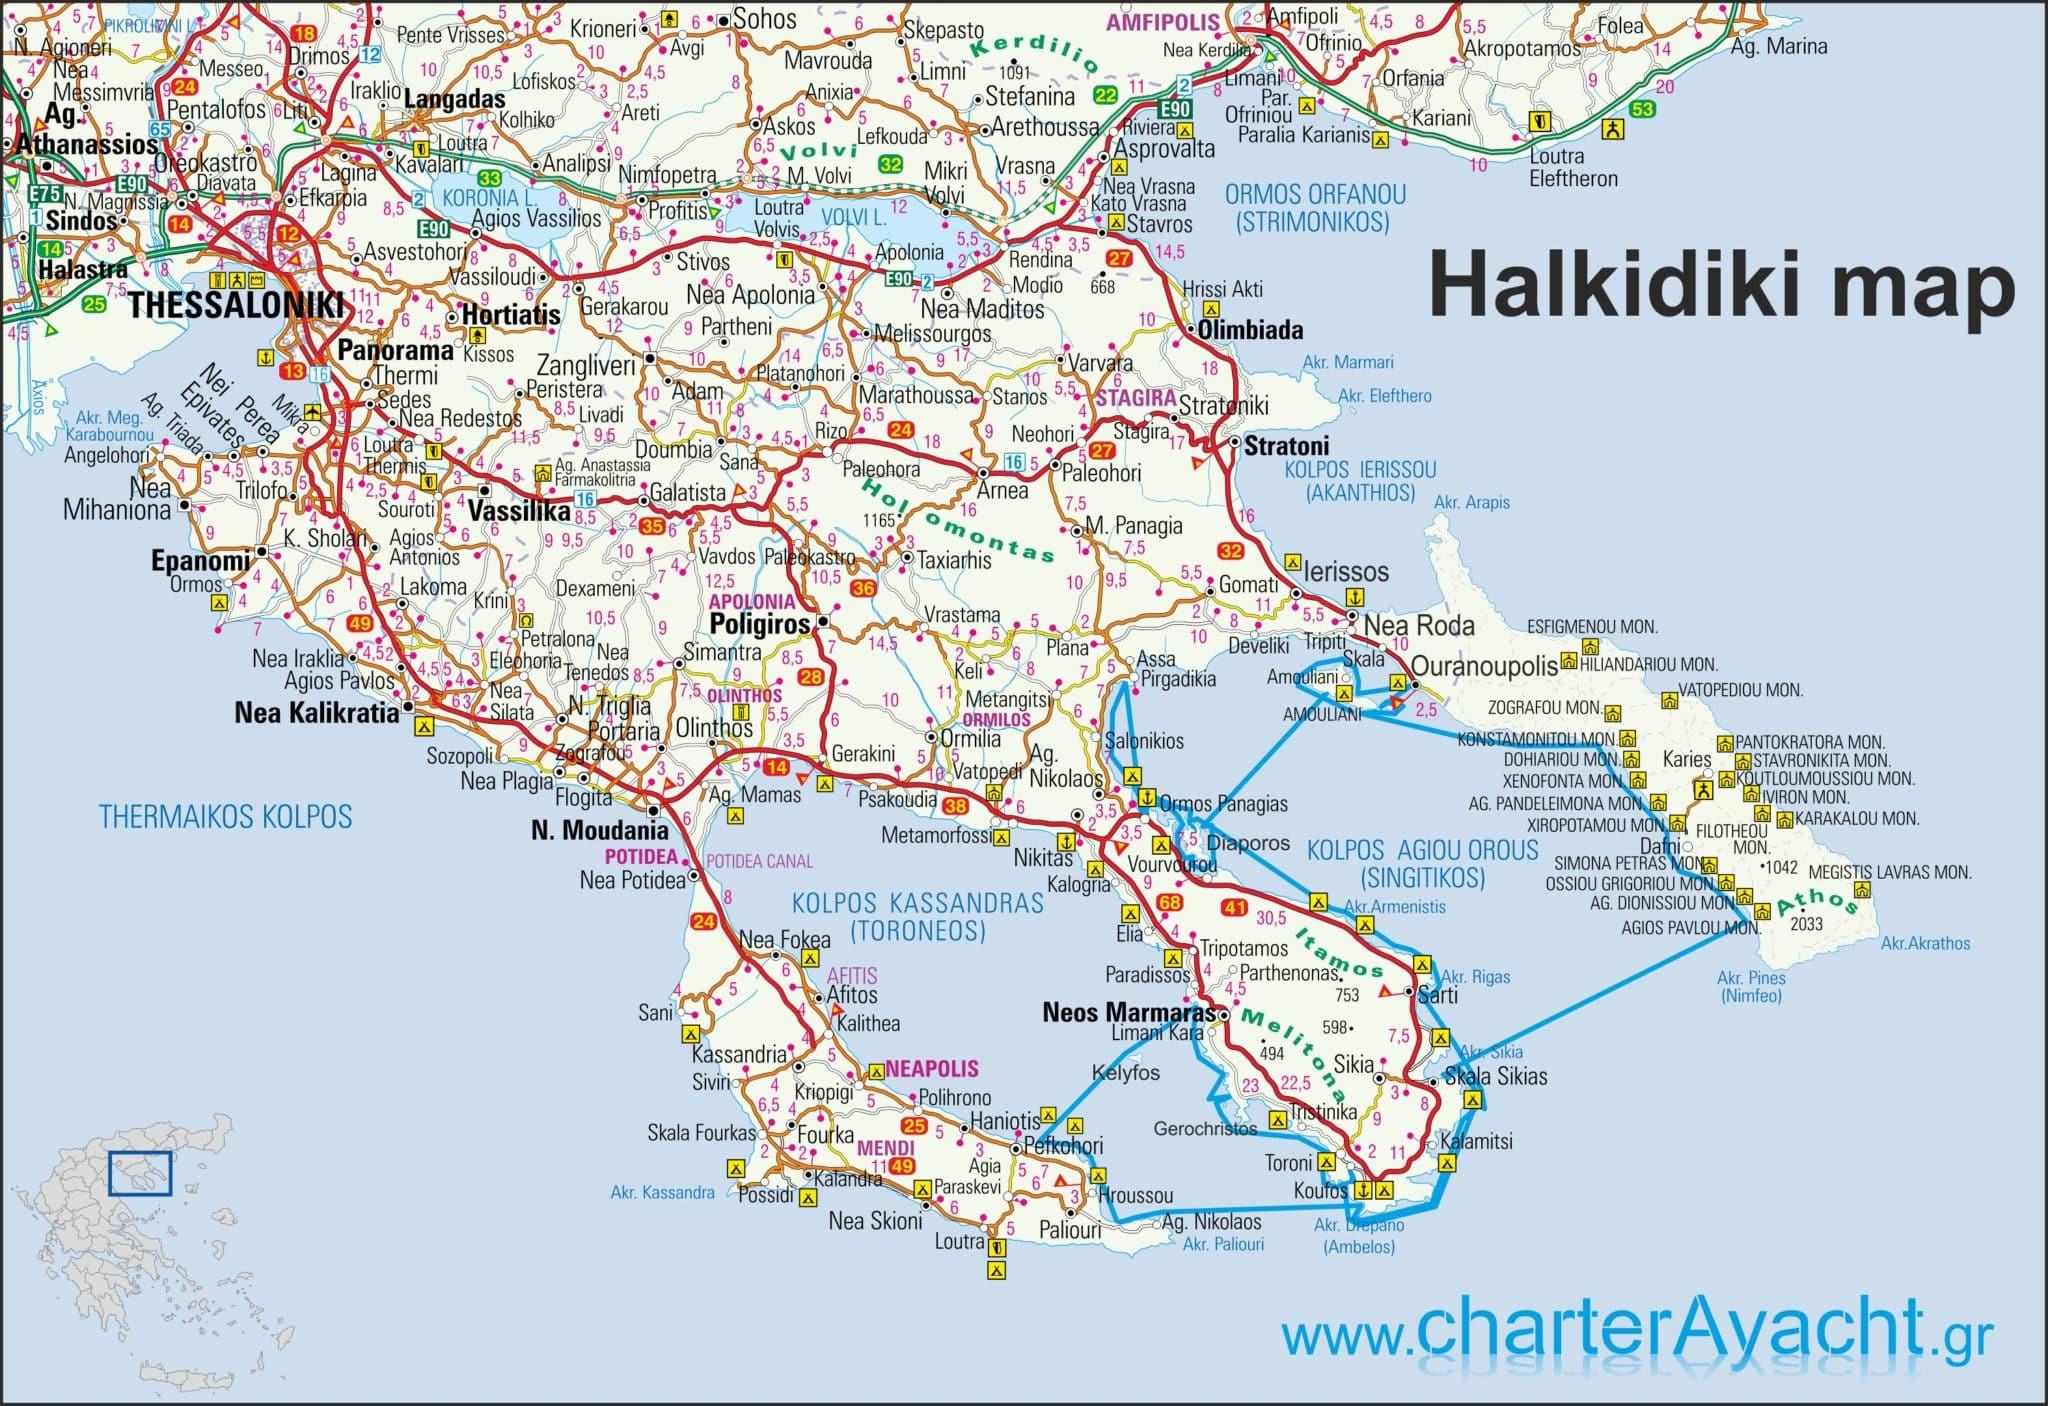 Halkidiki Atos Mapa Superjoden